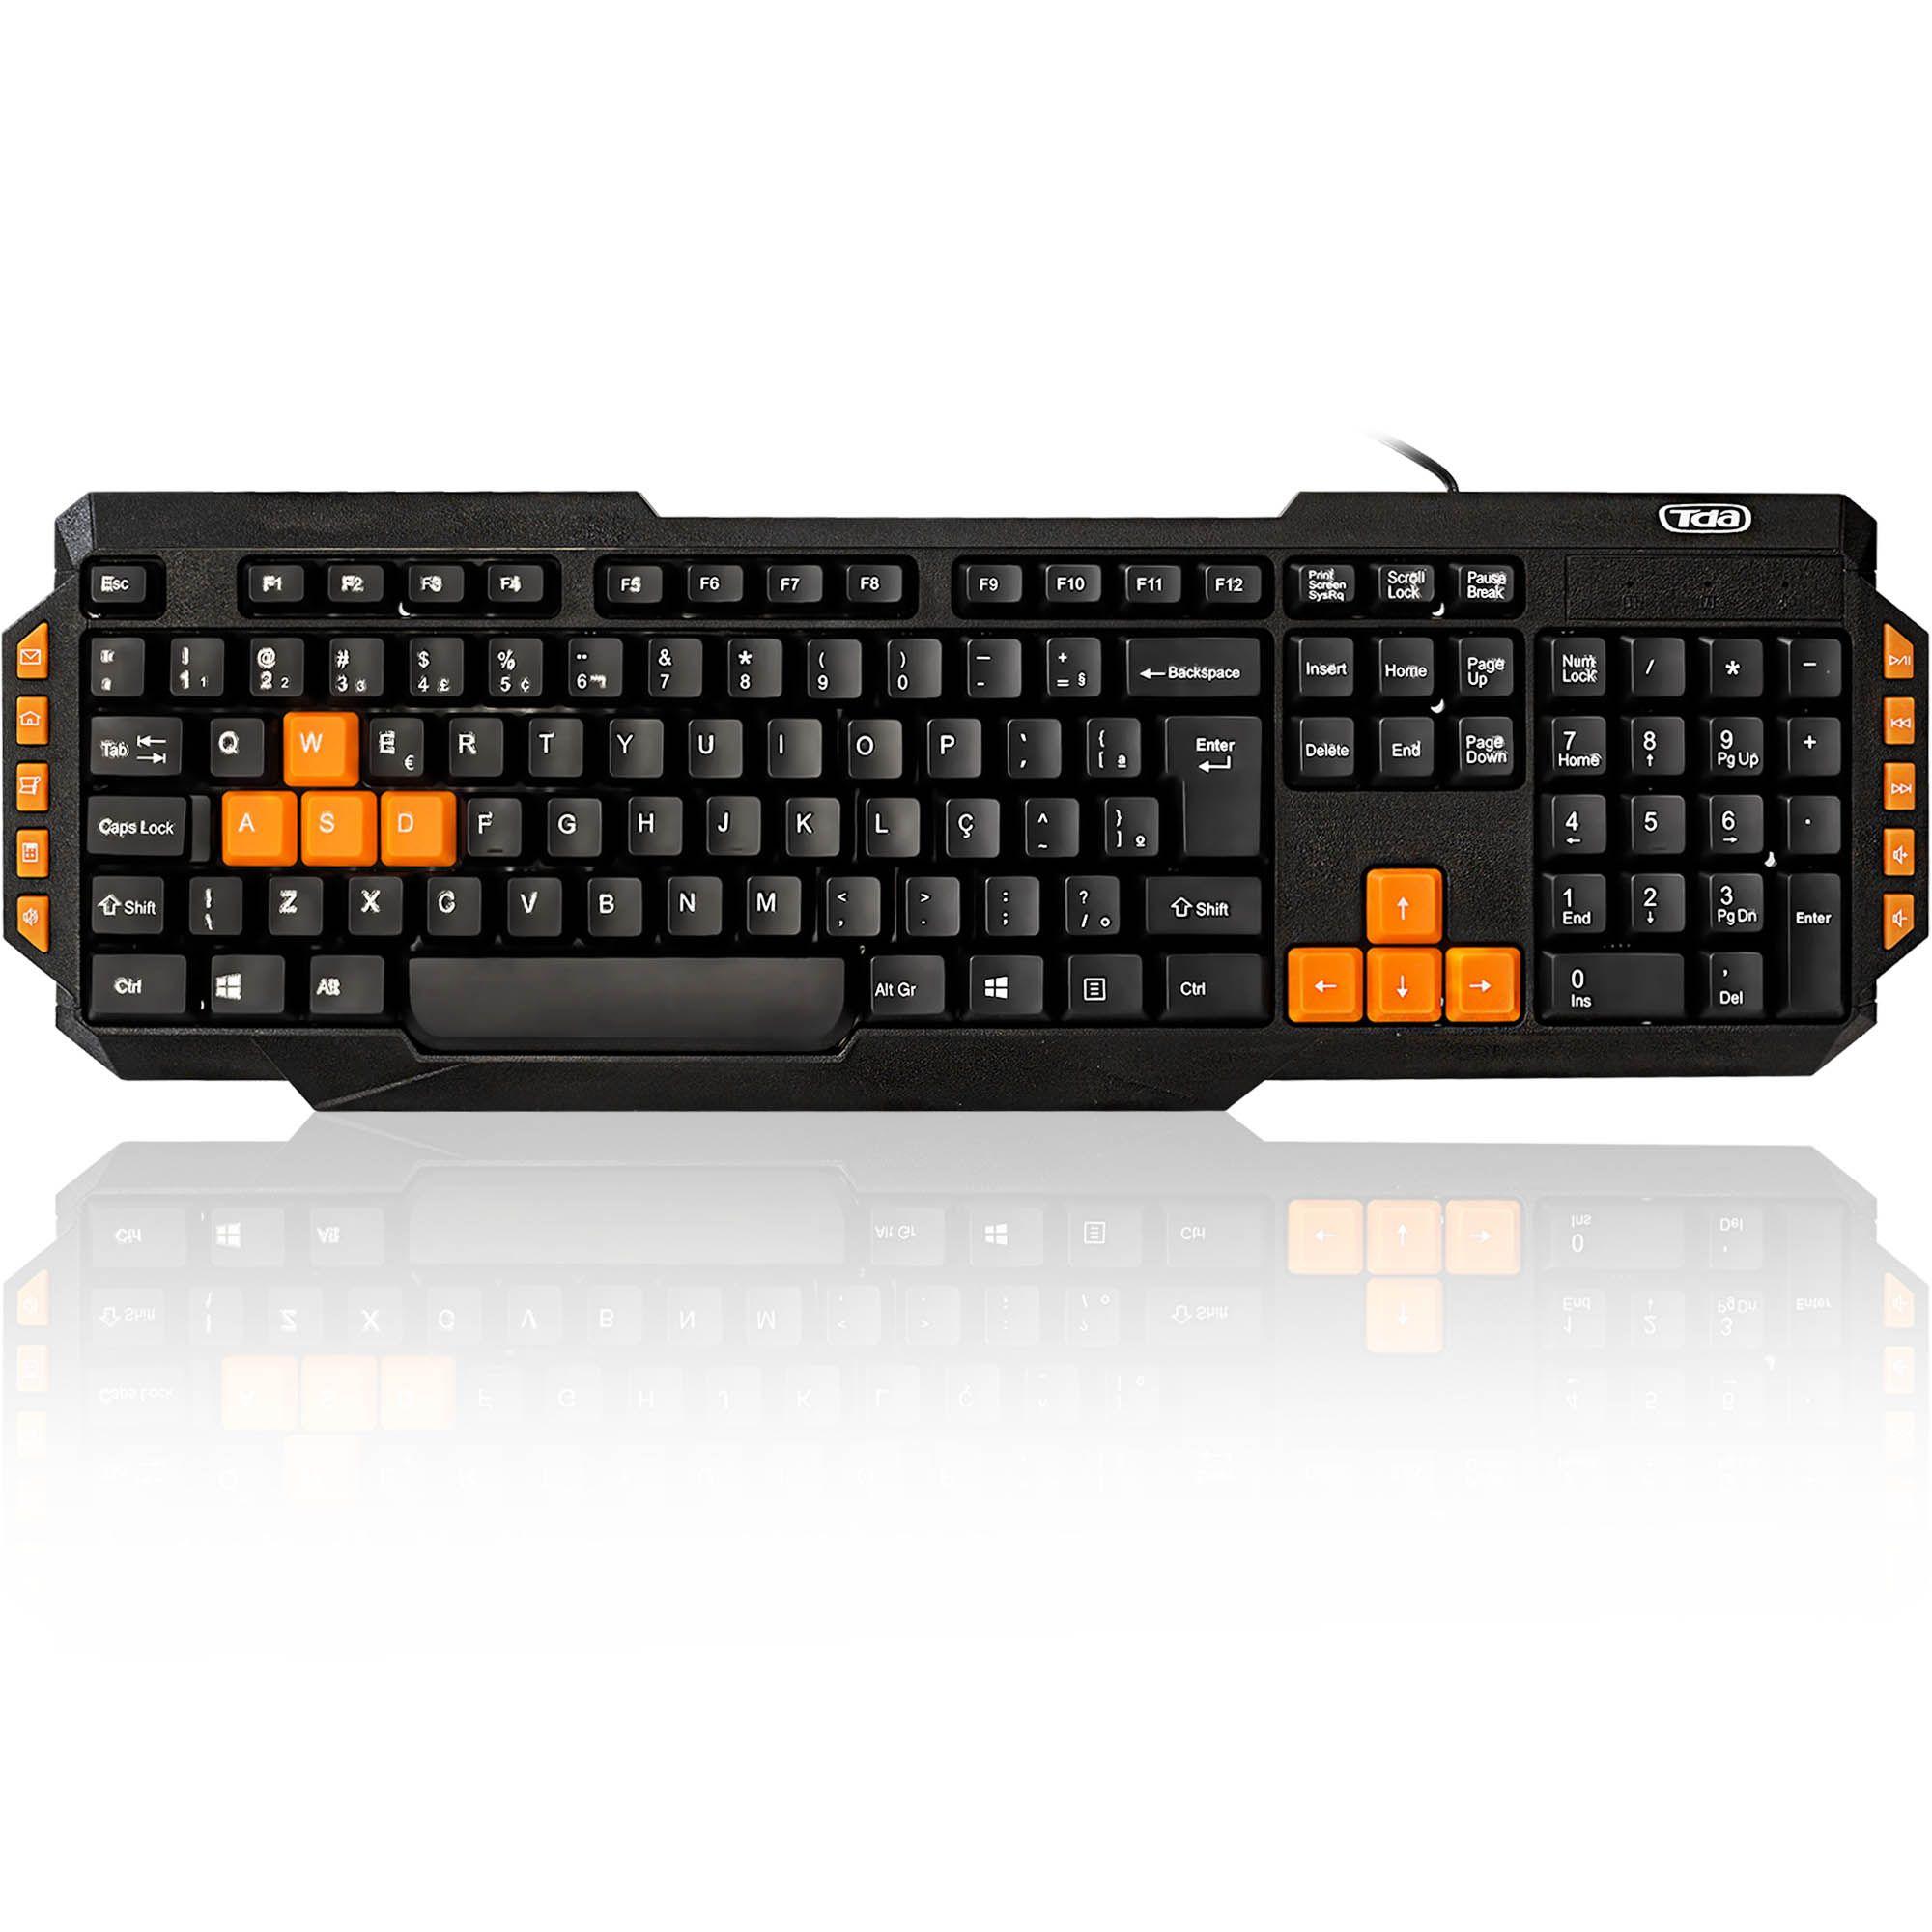 Teclado USB Gamer Series Orange Keys TDA